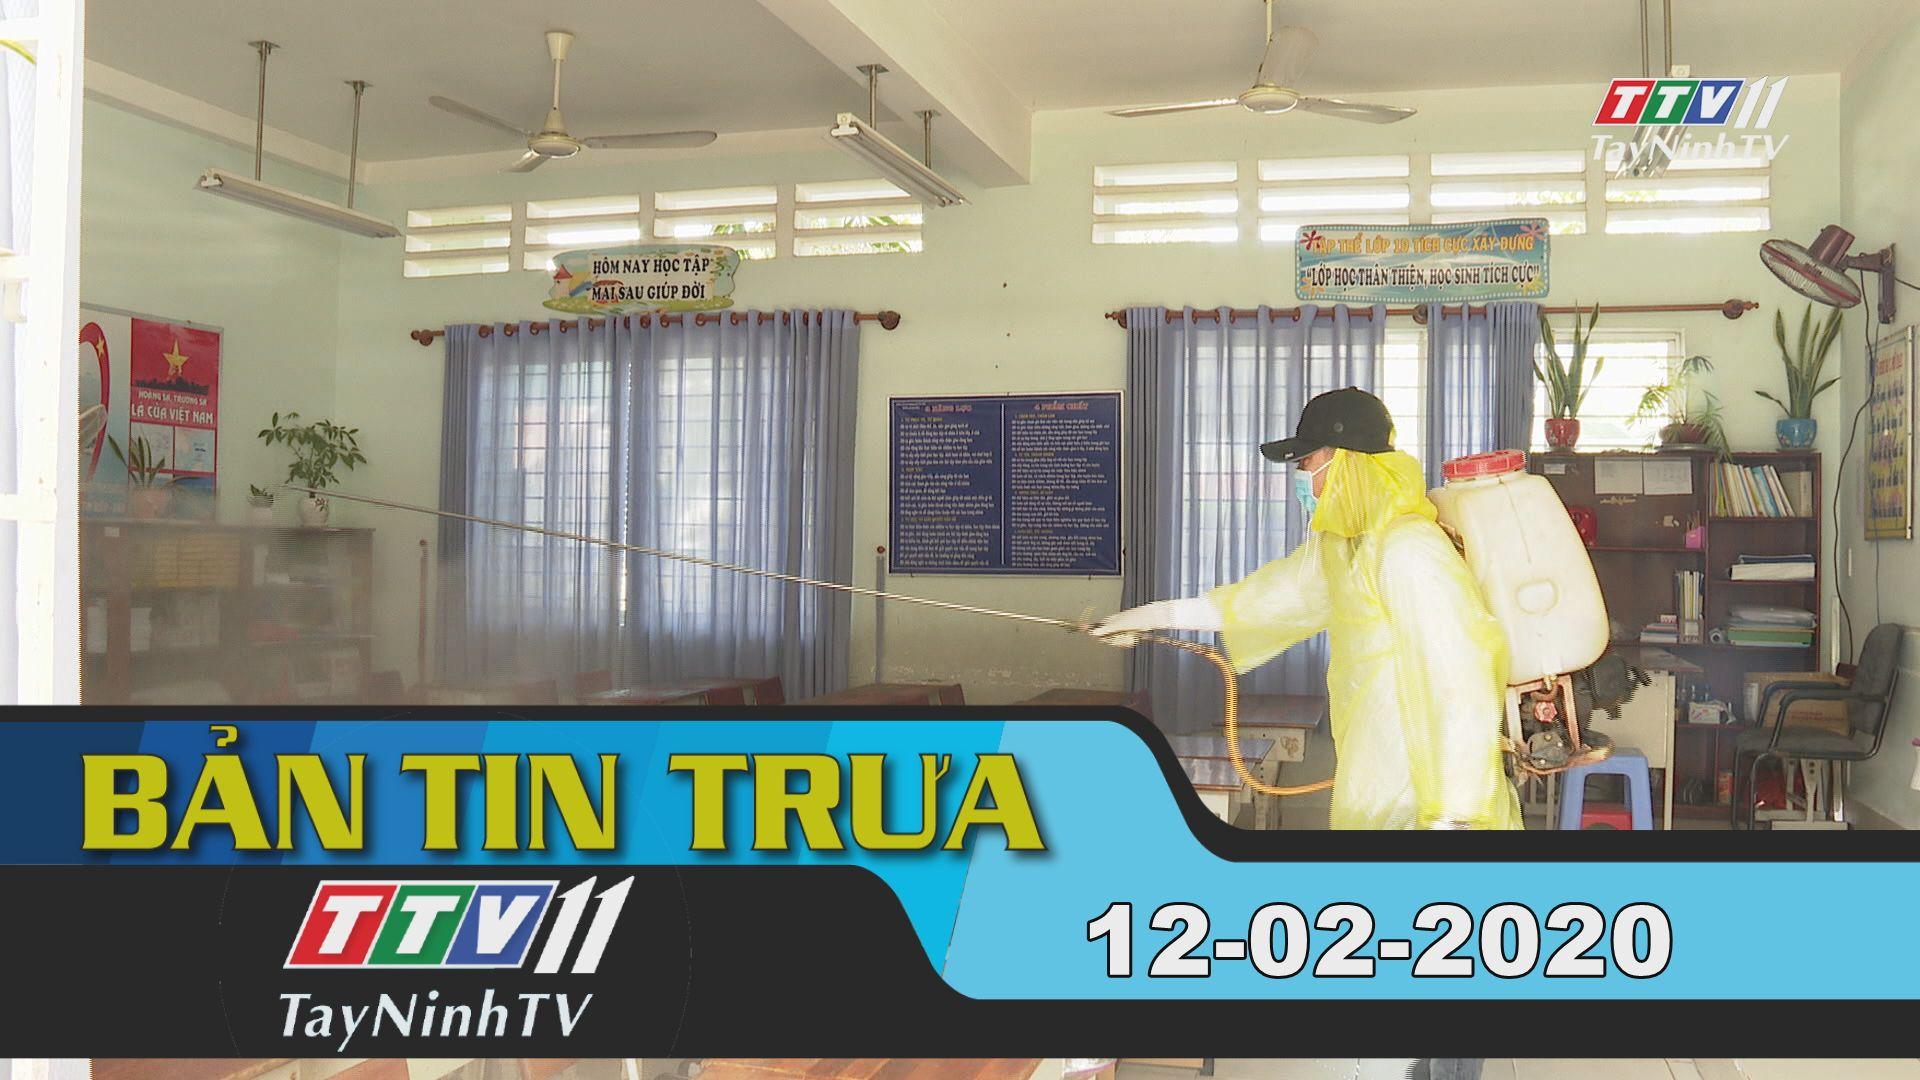 Bản tin trưa 12-02-2020 | Tin tức hôm nay | TayNinhTV